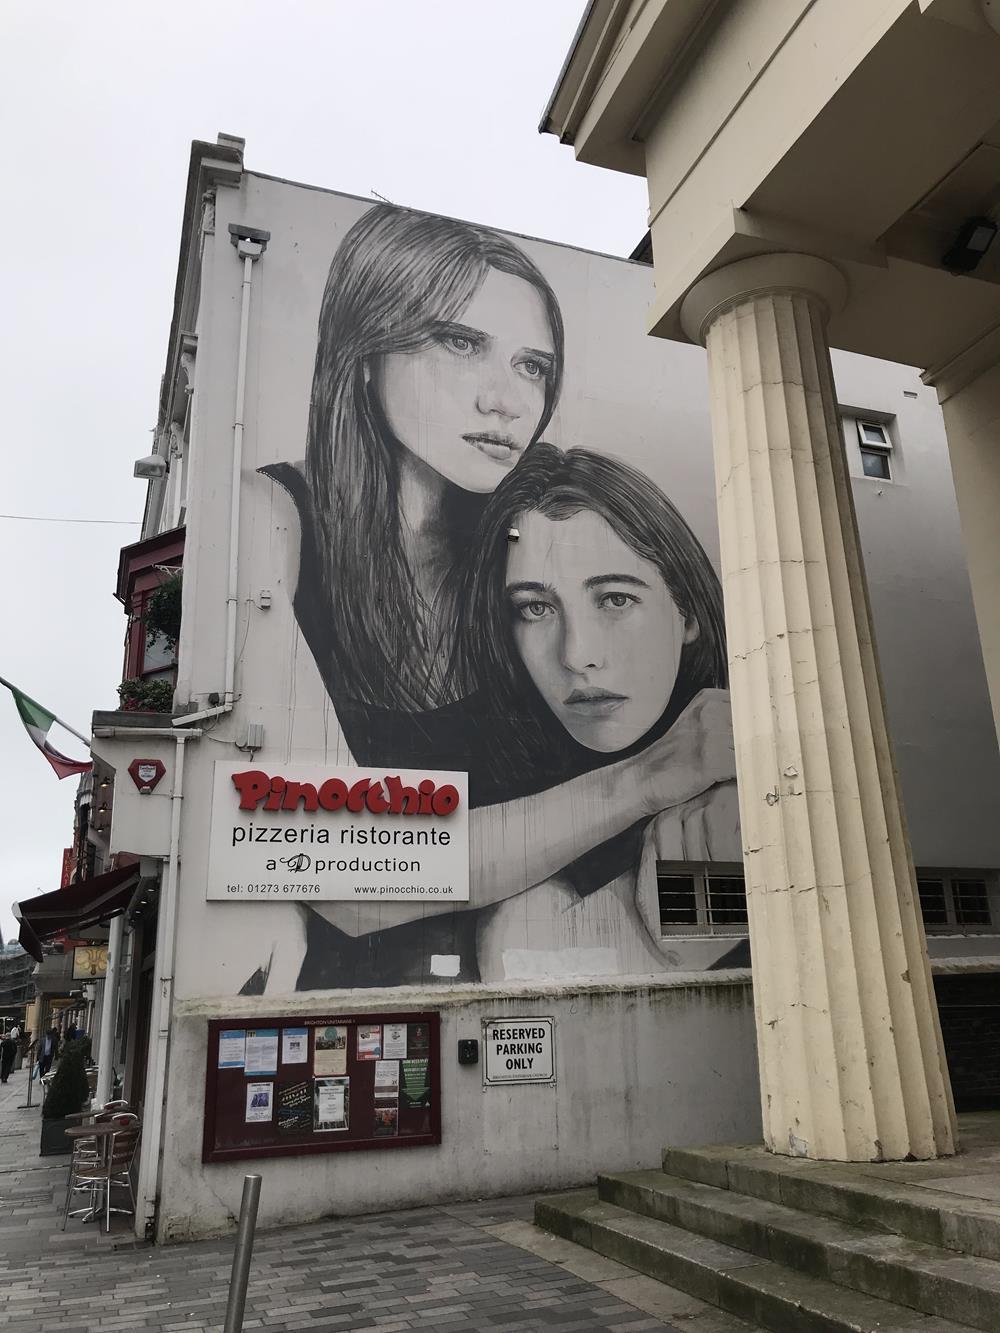 Pinocchio restaurant street art in Brighton